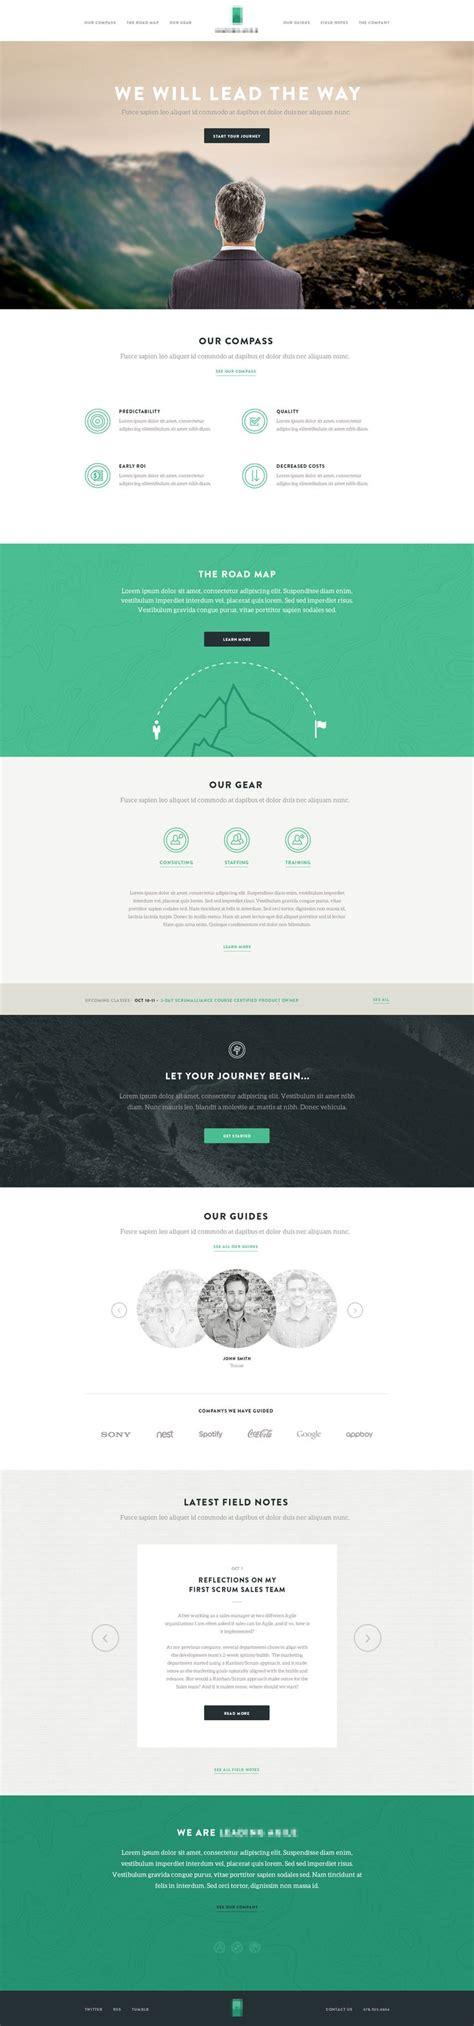 web design layout pinterest best 25 website layout ideas on pinterest web layout